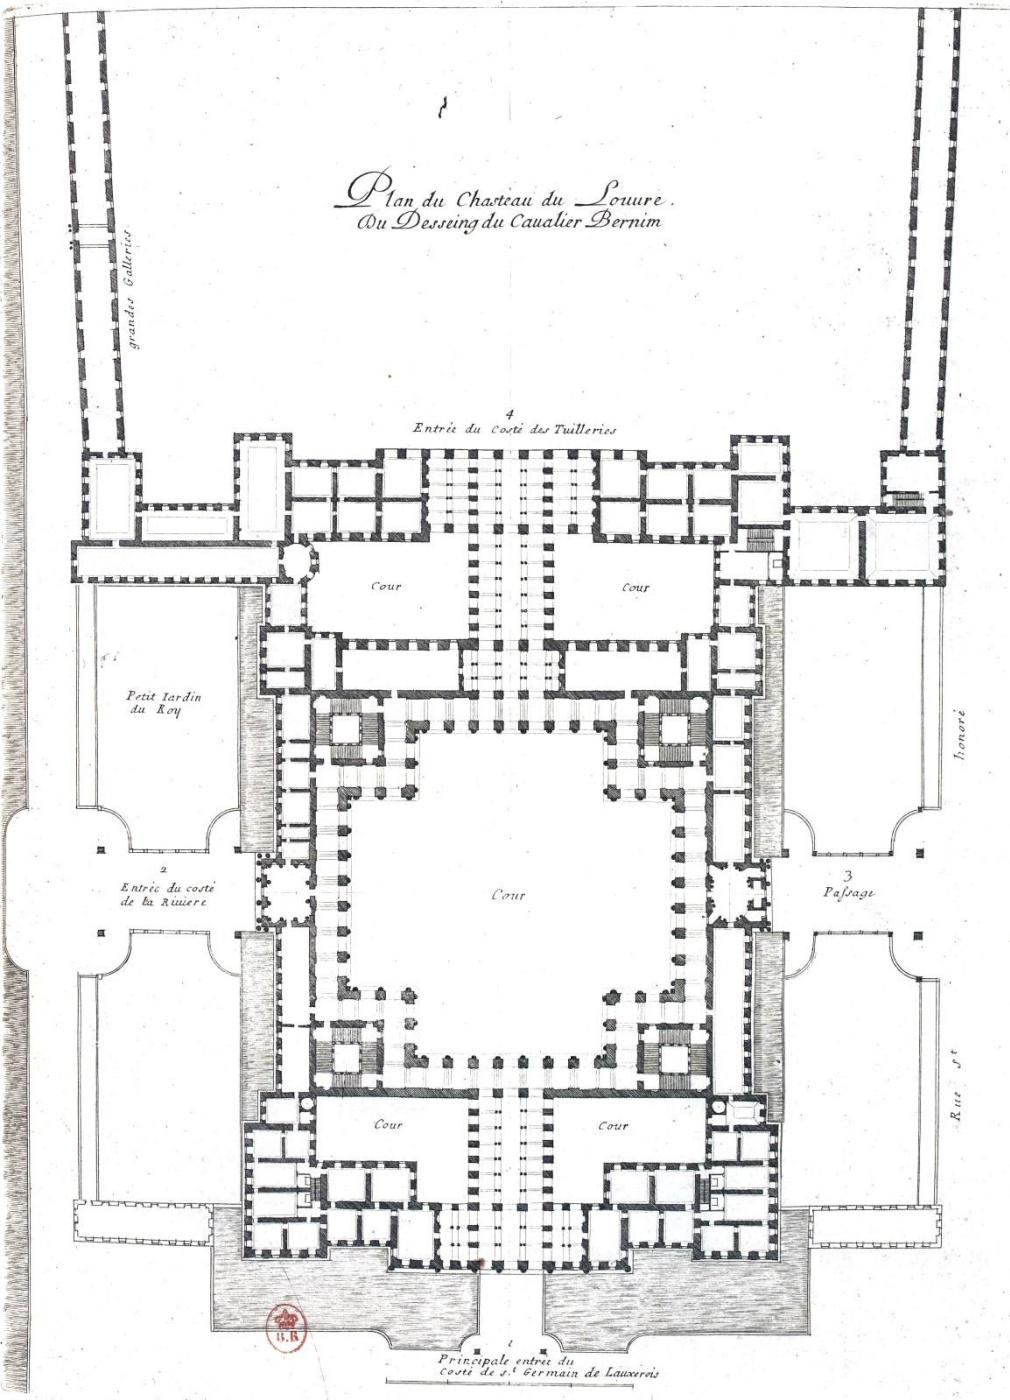 Gian Lorenzo Bernini. The third (final) project of the Louvre